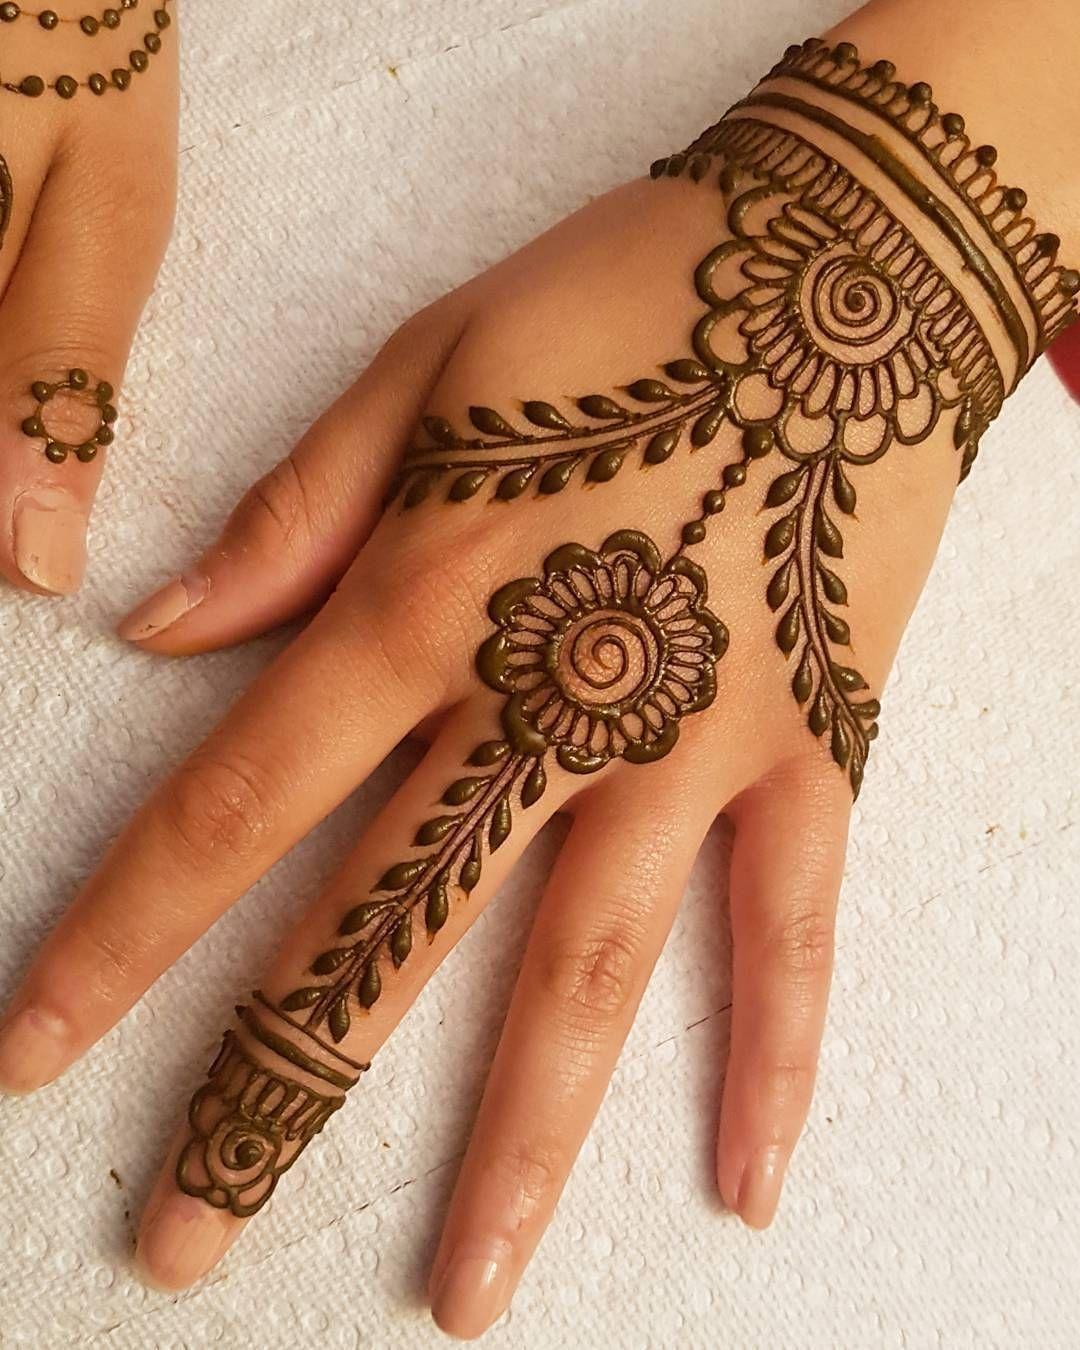 Amazon Com Henna Tattoo Kit In 2020 Henna Tattoo Designs Simple Beginner Henna Designs Henna Tattoo Kit